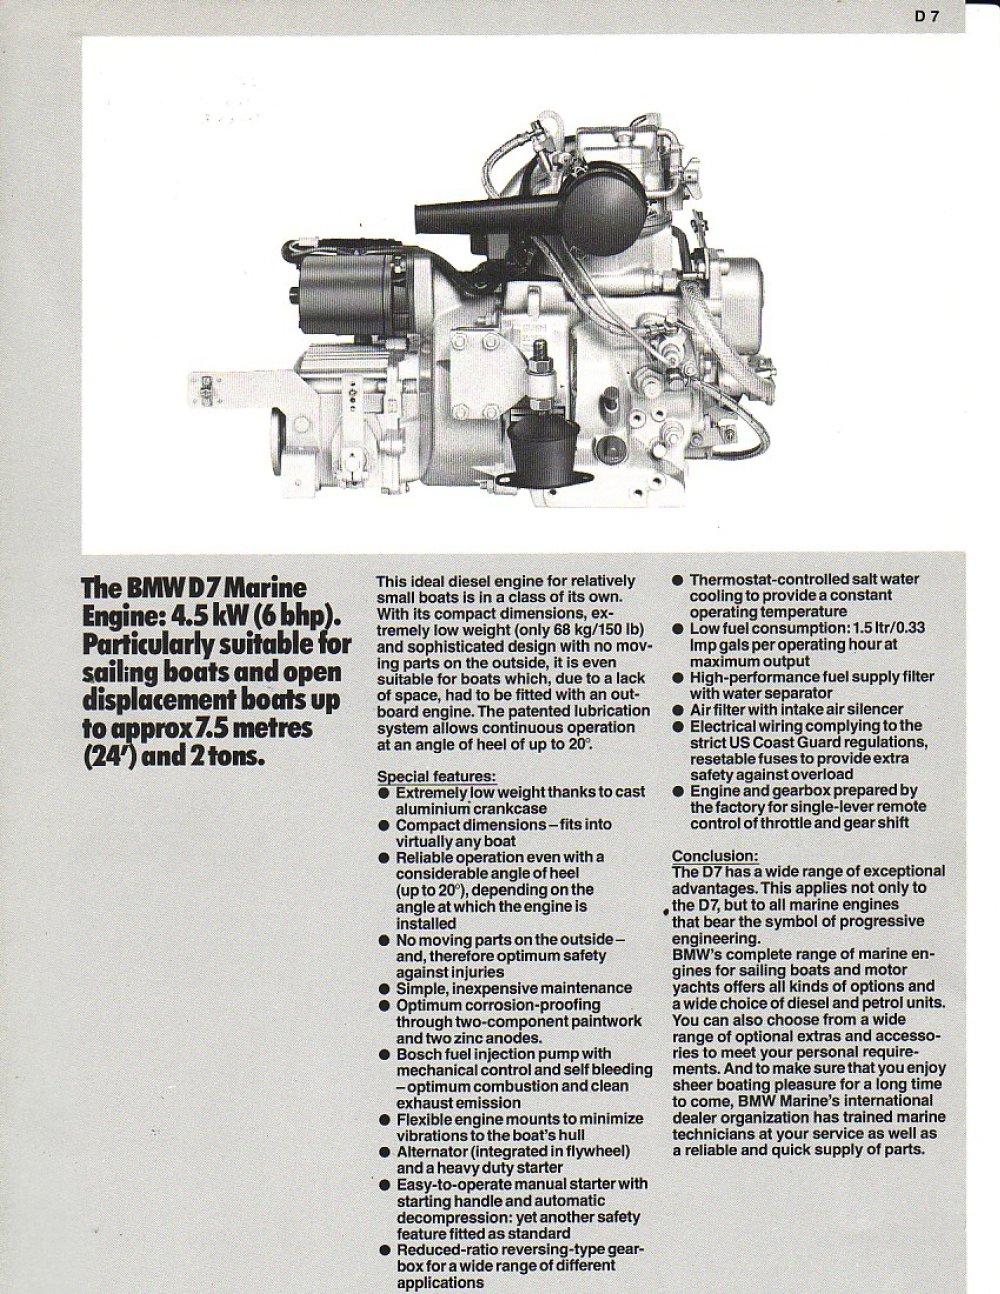 bmw marine engine d7 diesel bmw marine pdf catalogues rh pdf nauticexpo com